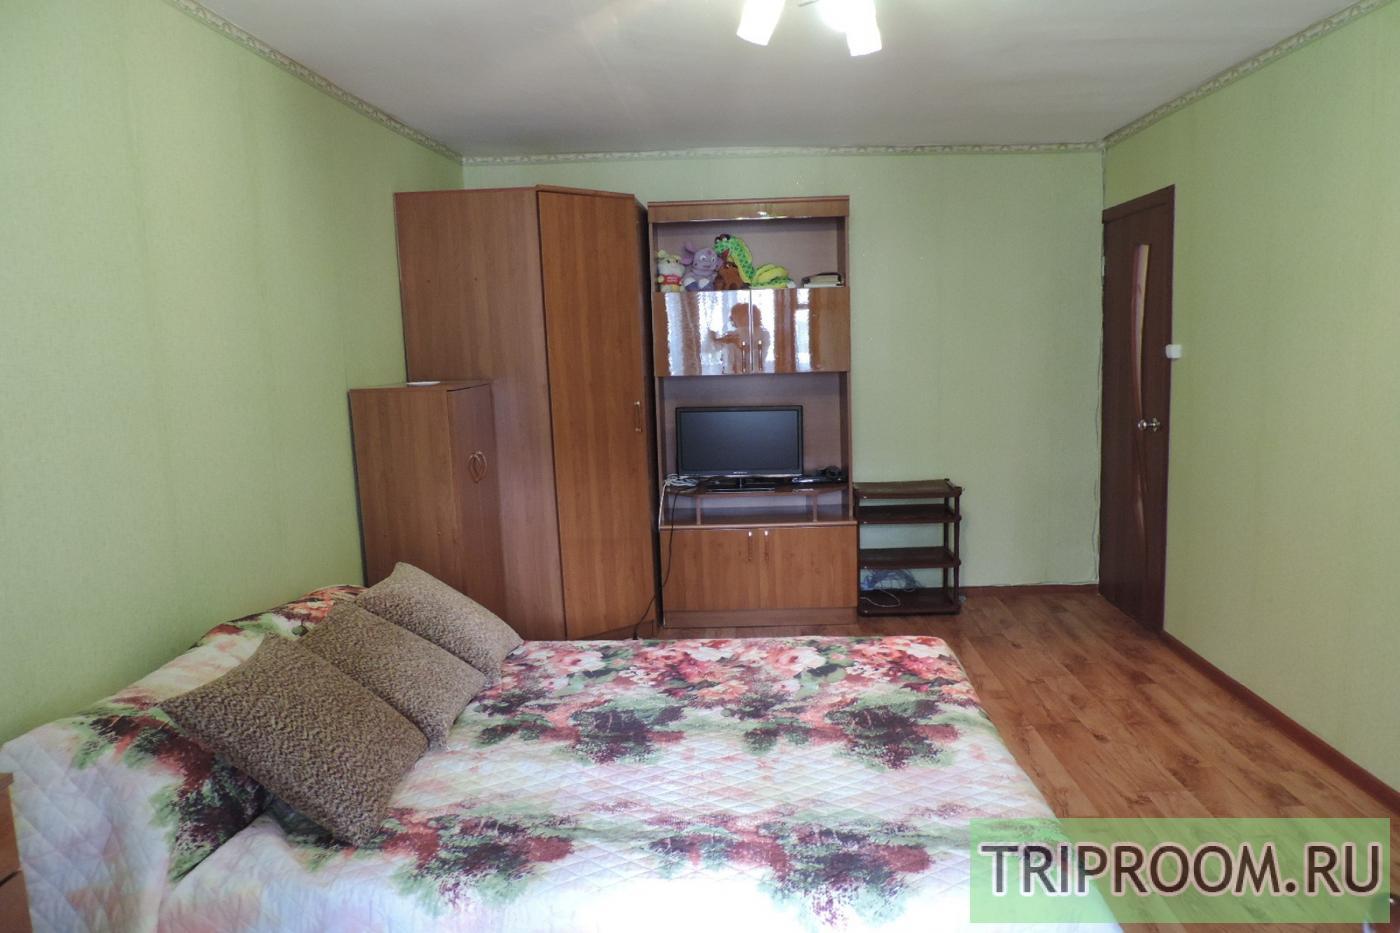 1-комнатная квартира посуточно (вариант № 734), ул. Лазарева улица, фото № 1